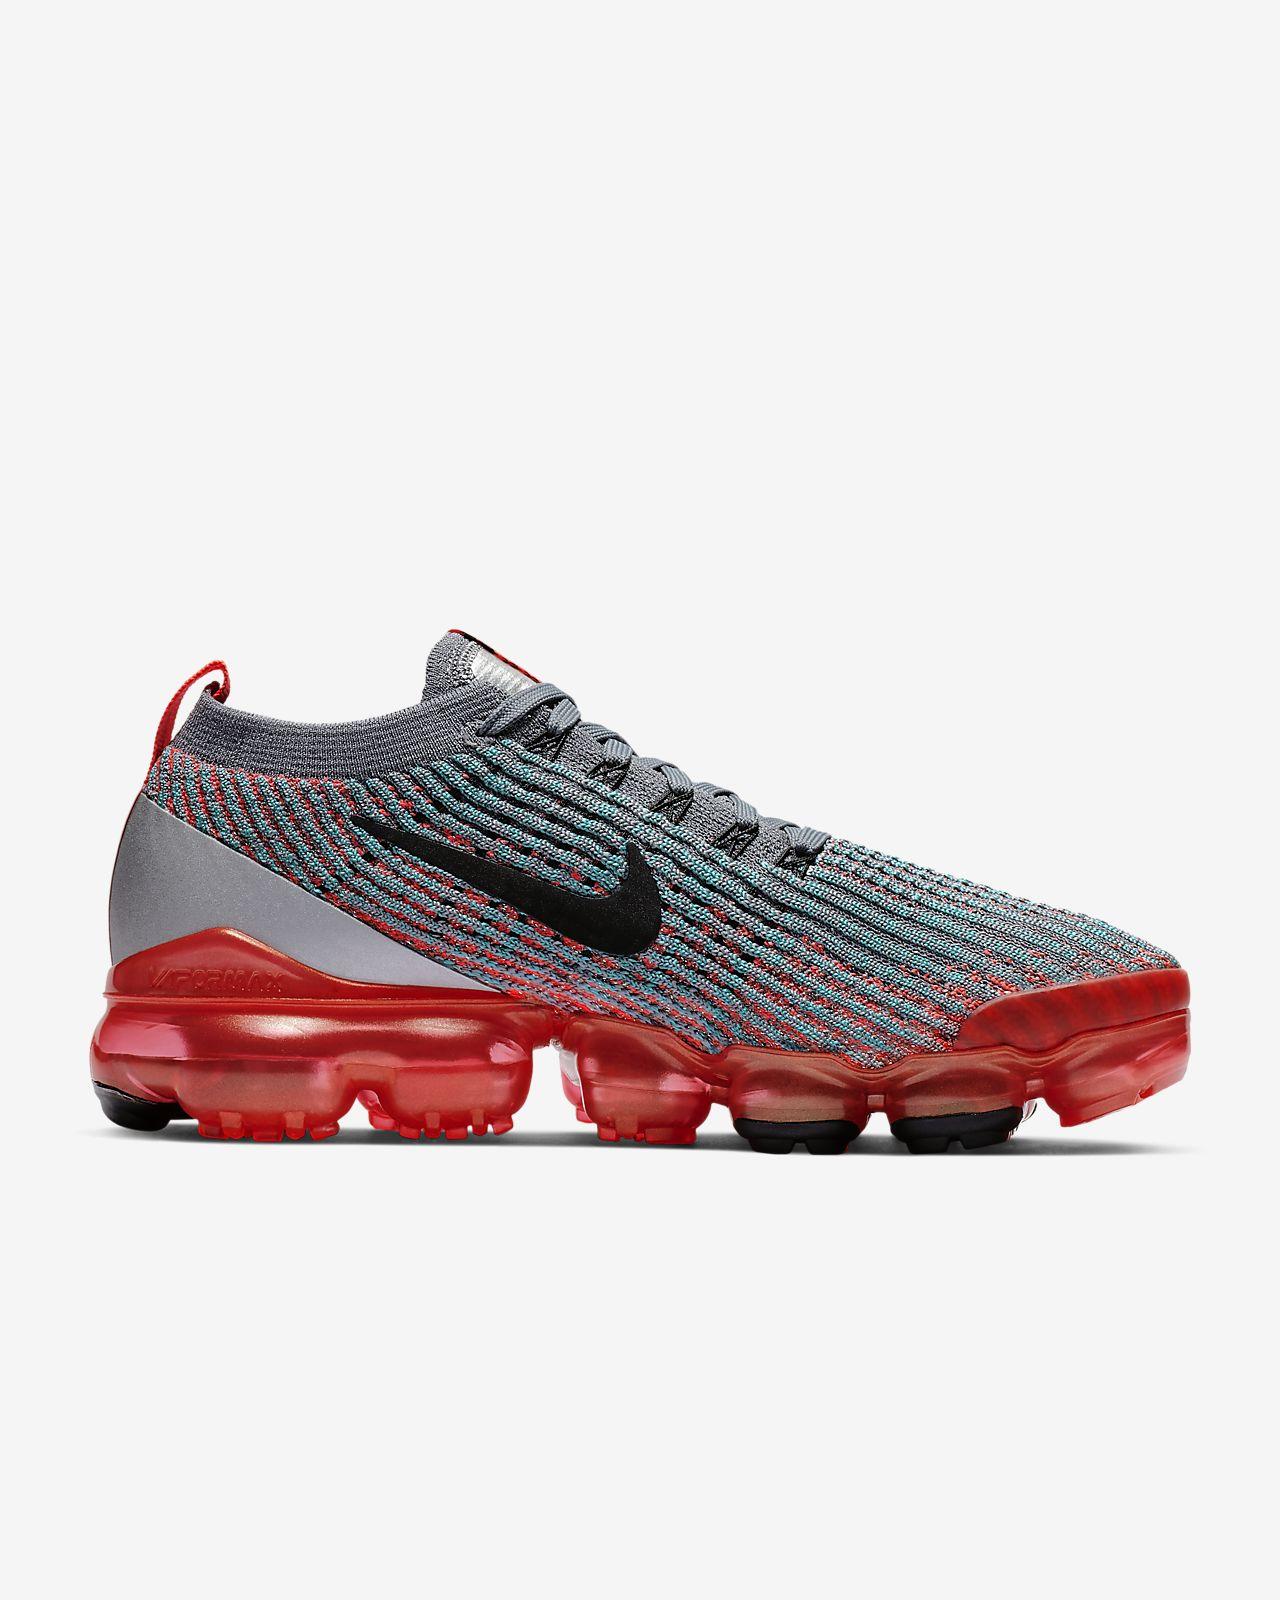 e3fa1d92c91e6 Men Nike Air VaporMax Flyknit 3 Running Shoes SKU 1350-546 2020 ... Nike  Air VaporMax Flyknit 3 Women s Shoe. nike vapormax flyknit 3